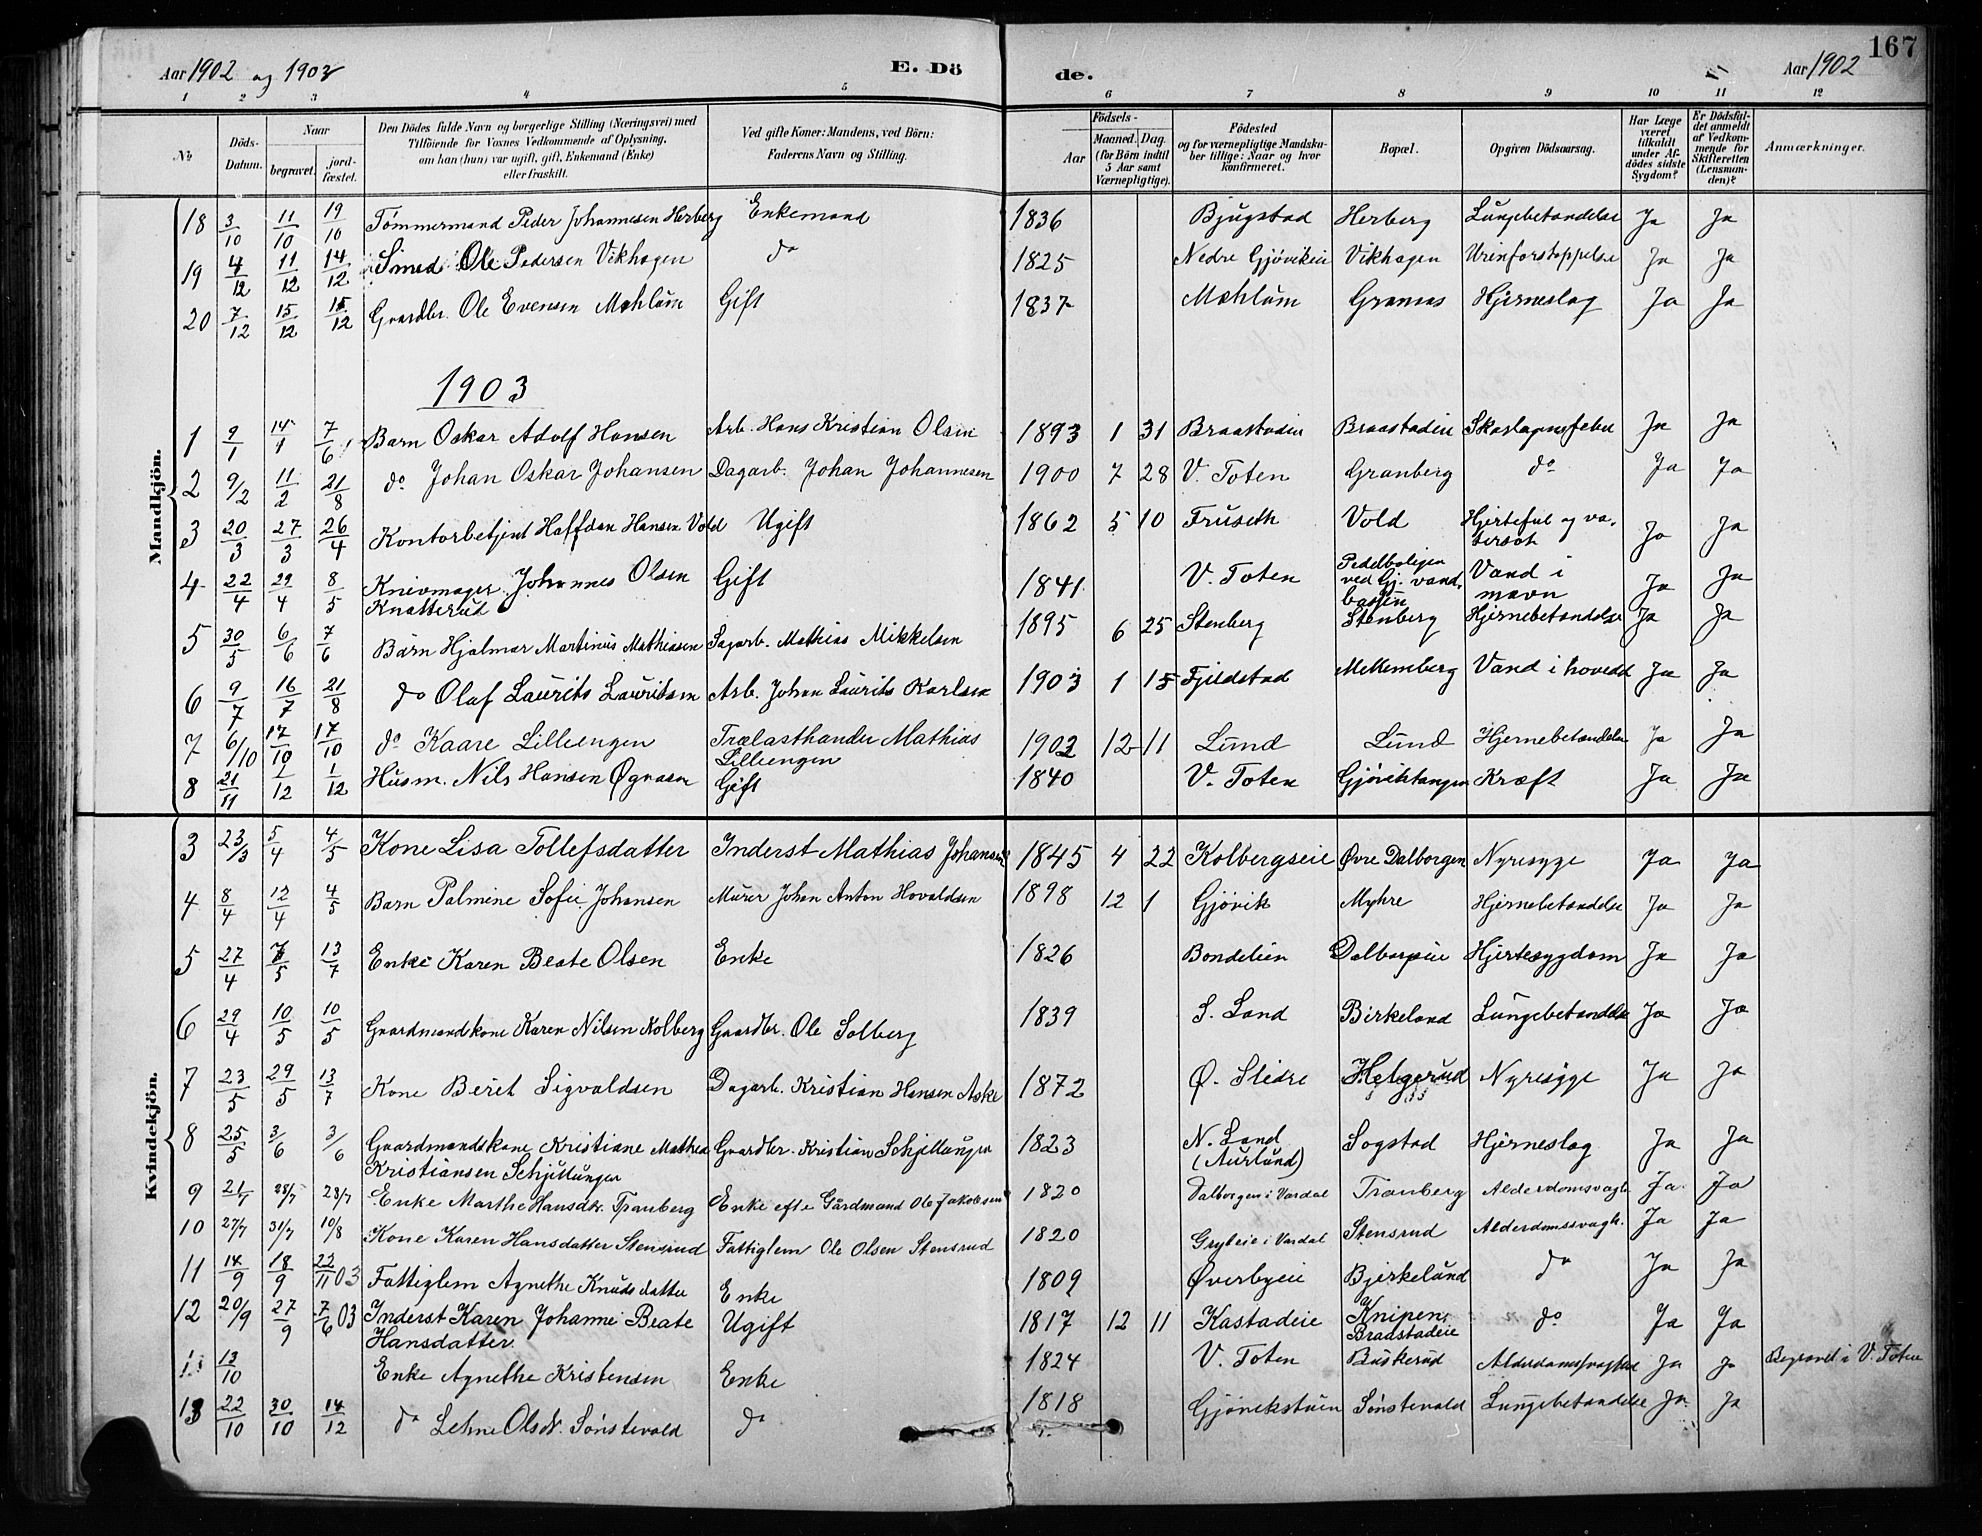 SAH, Vardal prestekontor, H/Ha/Hab/L0010: Klokkerbok nr. 10, 1895-1903, s. 167